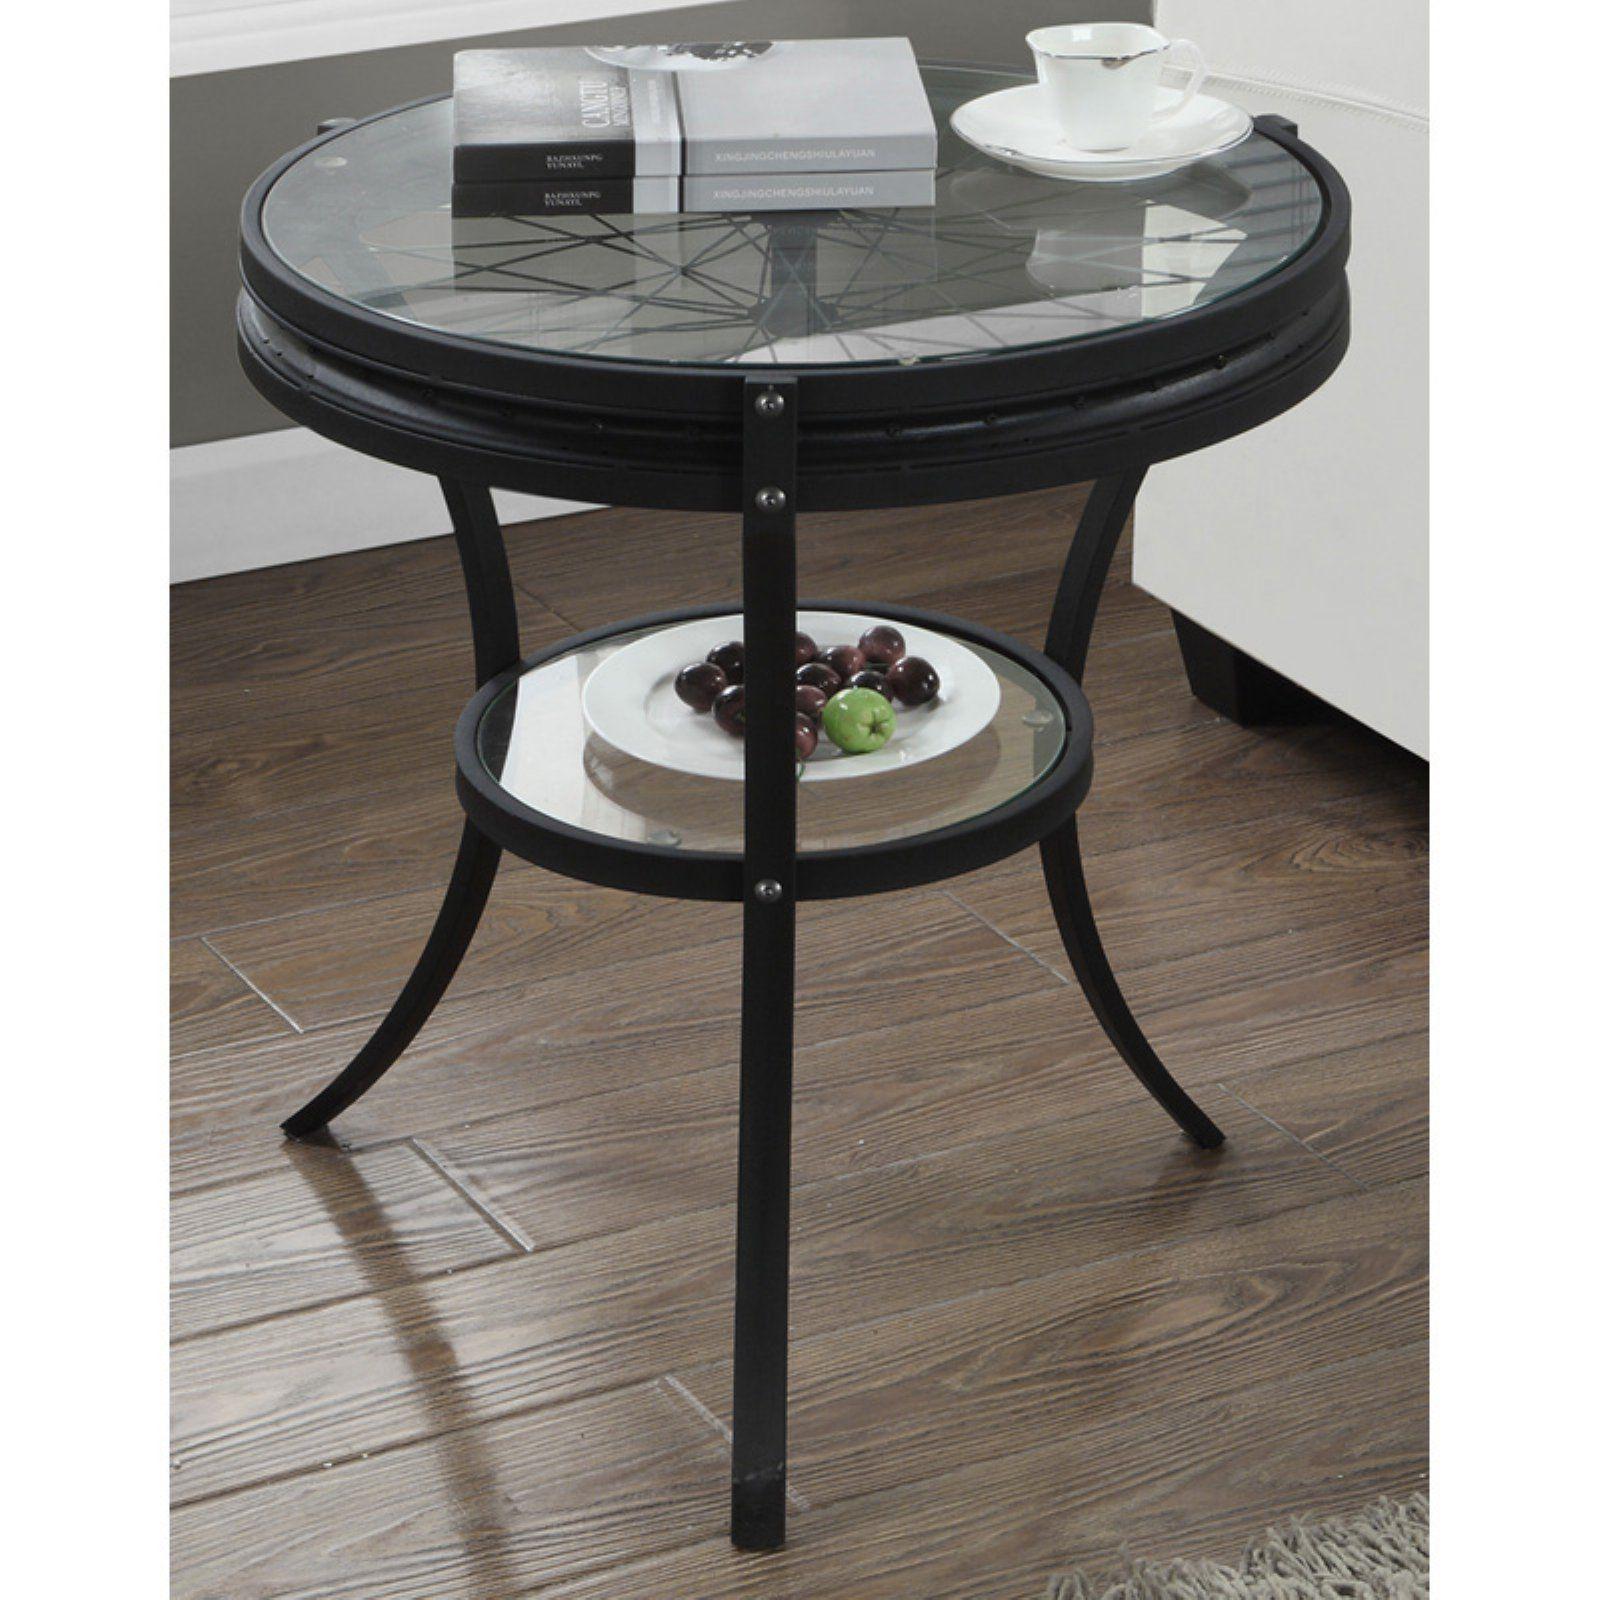 Monarch Specialties Round Spoked Wheel Glass Top End Table Glass Top End Tables End Tables Tempered Glass Shelves